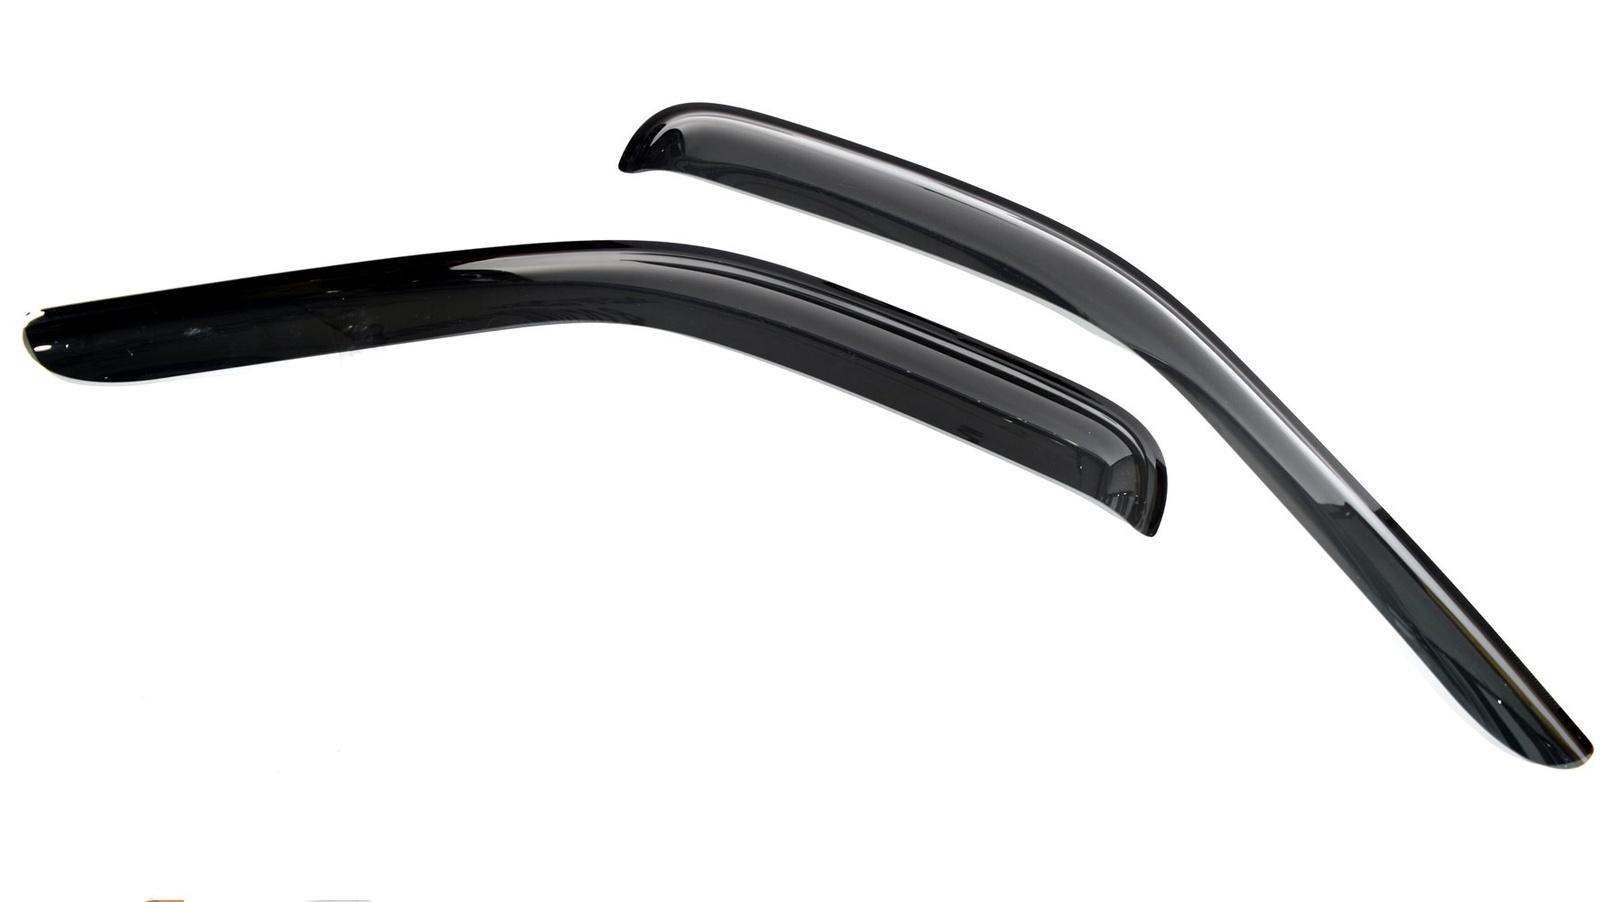 Ветровик SIM Дефлекторы боковых окон Ford Transit (2014-) (2шт.) (темн.) 1pcs right left car tail lamp light lens replacement for ford transit connect 2009 2014